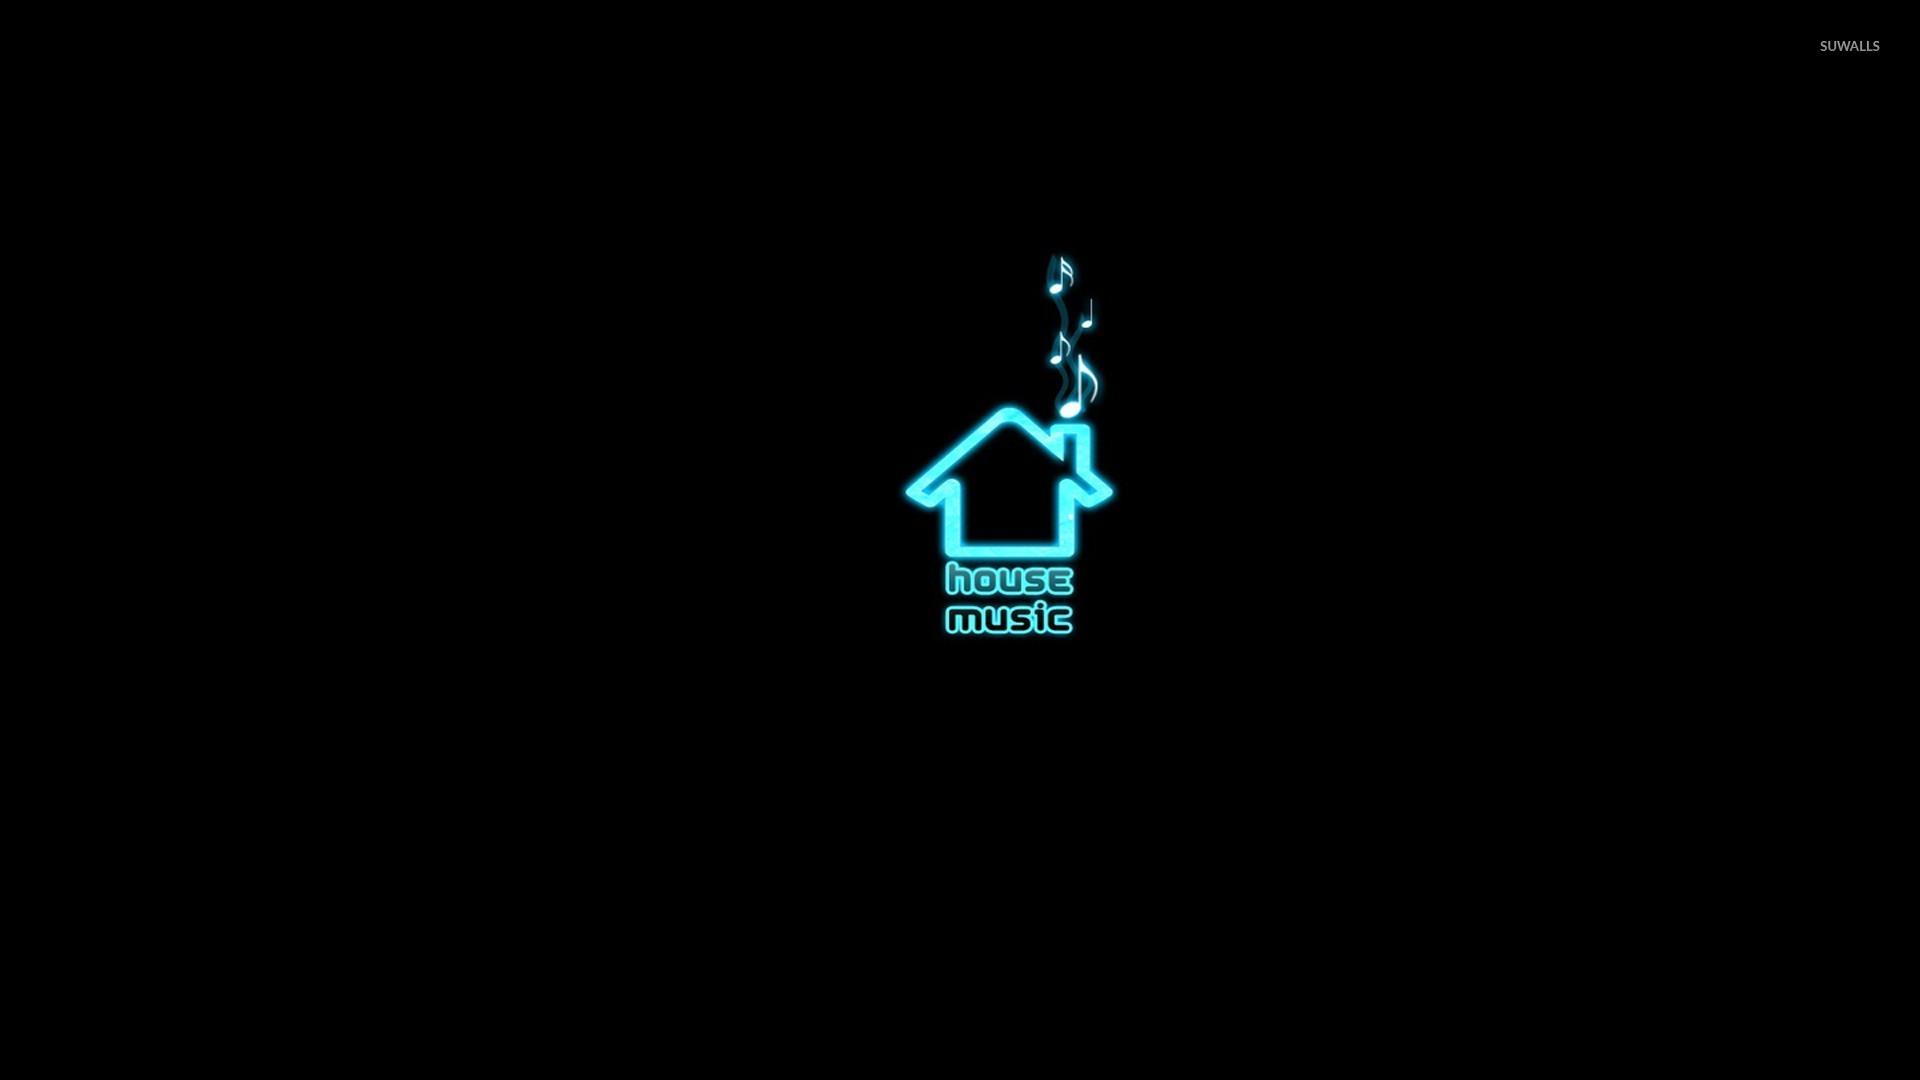 House Music Wallpaper Music Wallpapers 22783